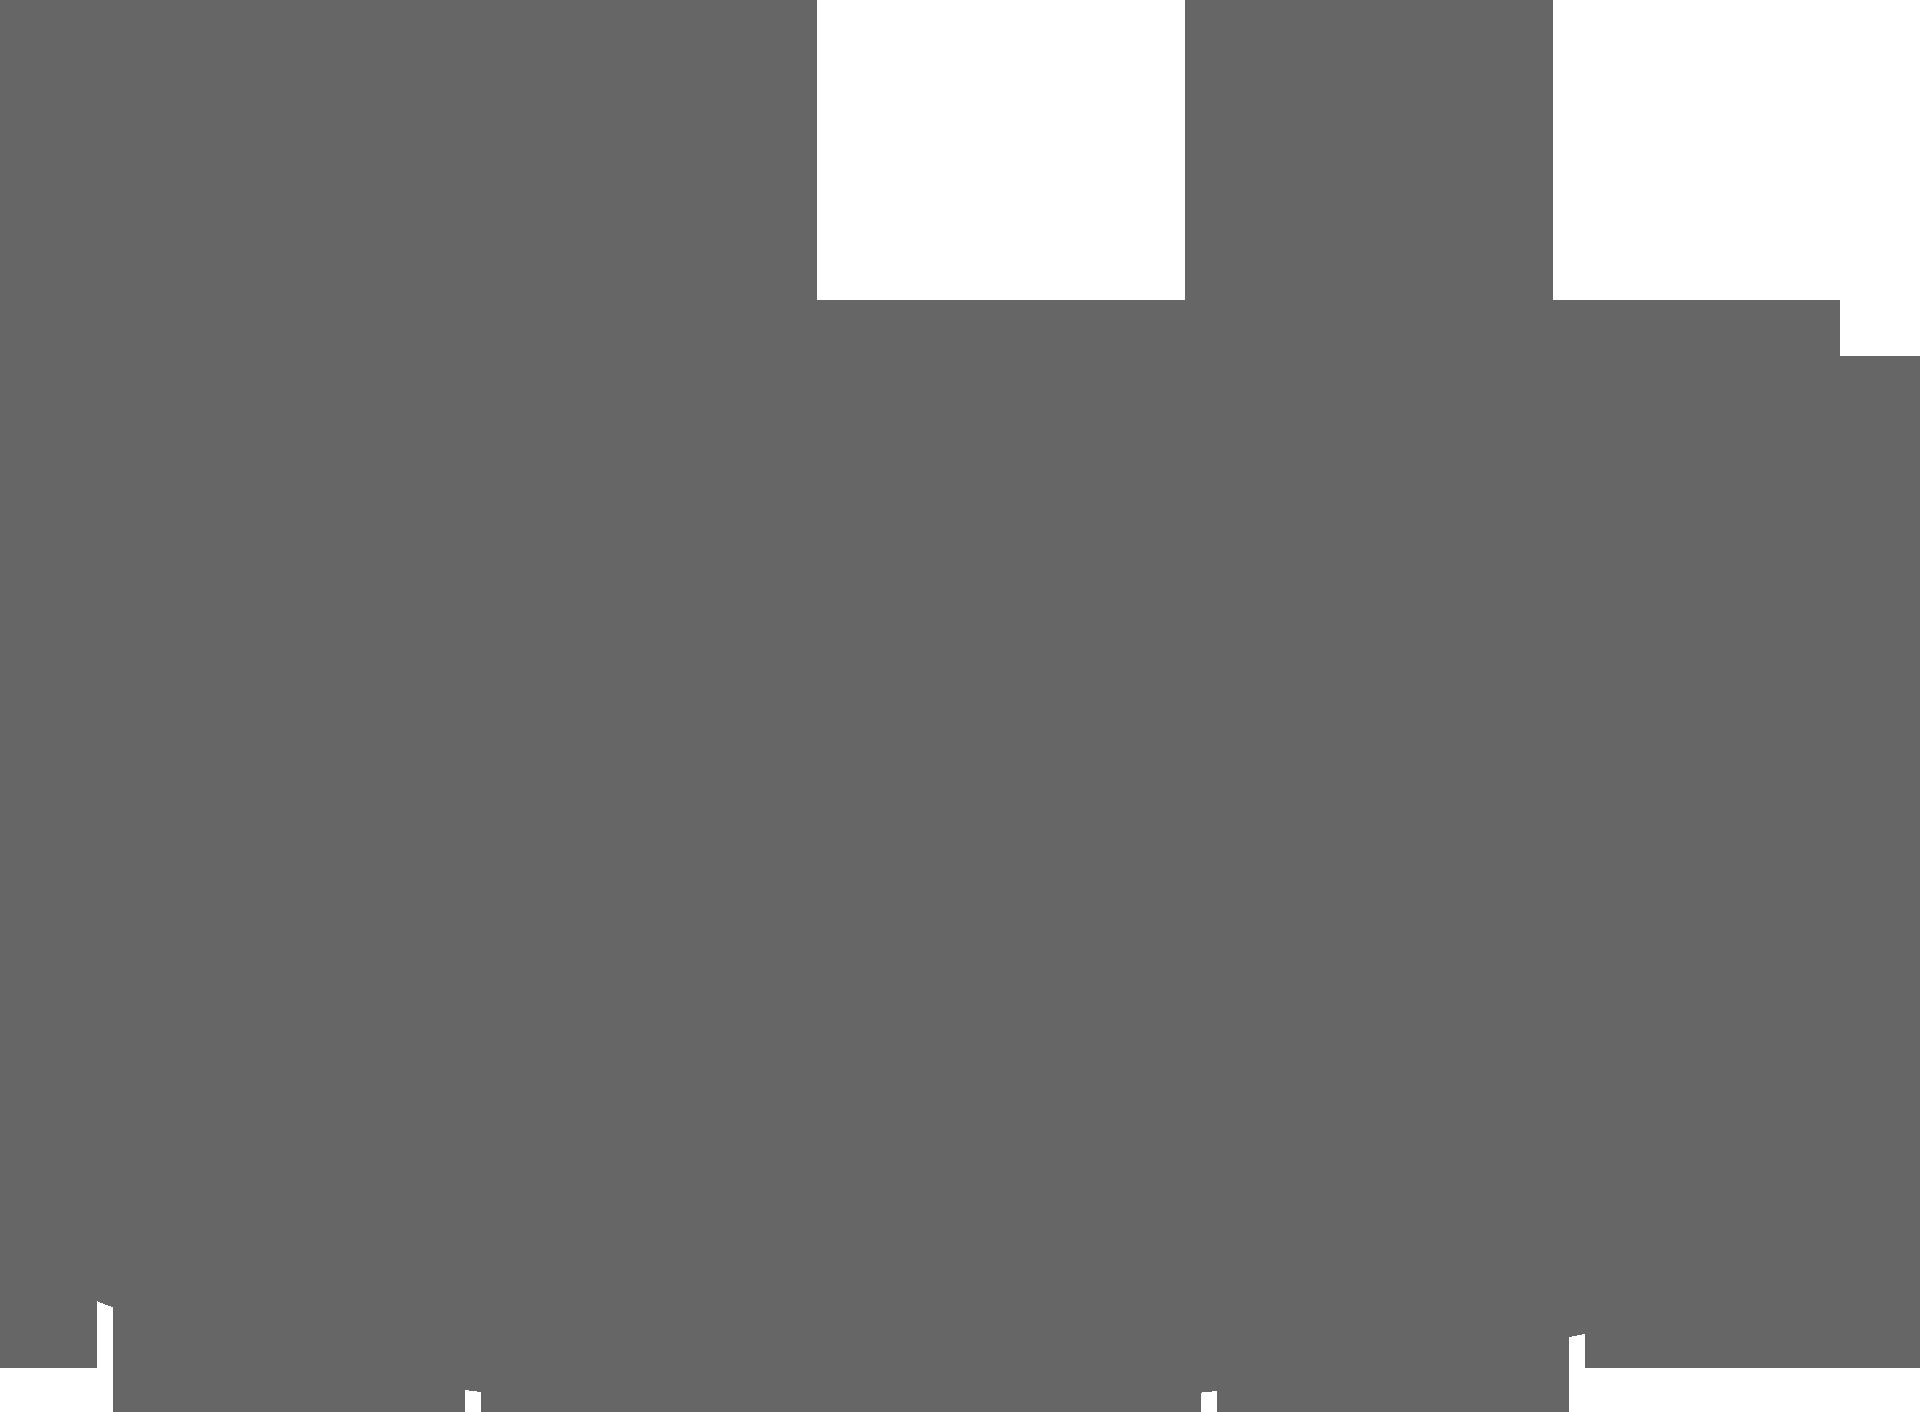 bg1-1